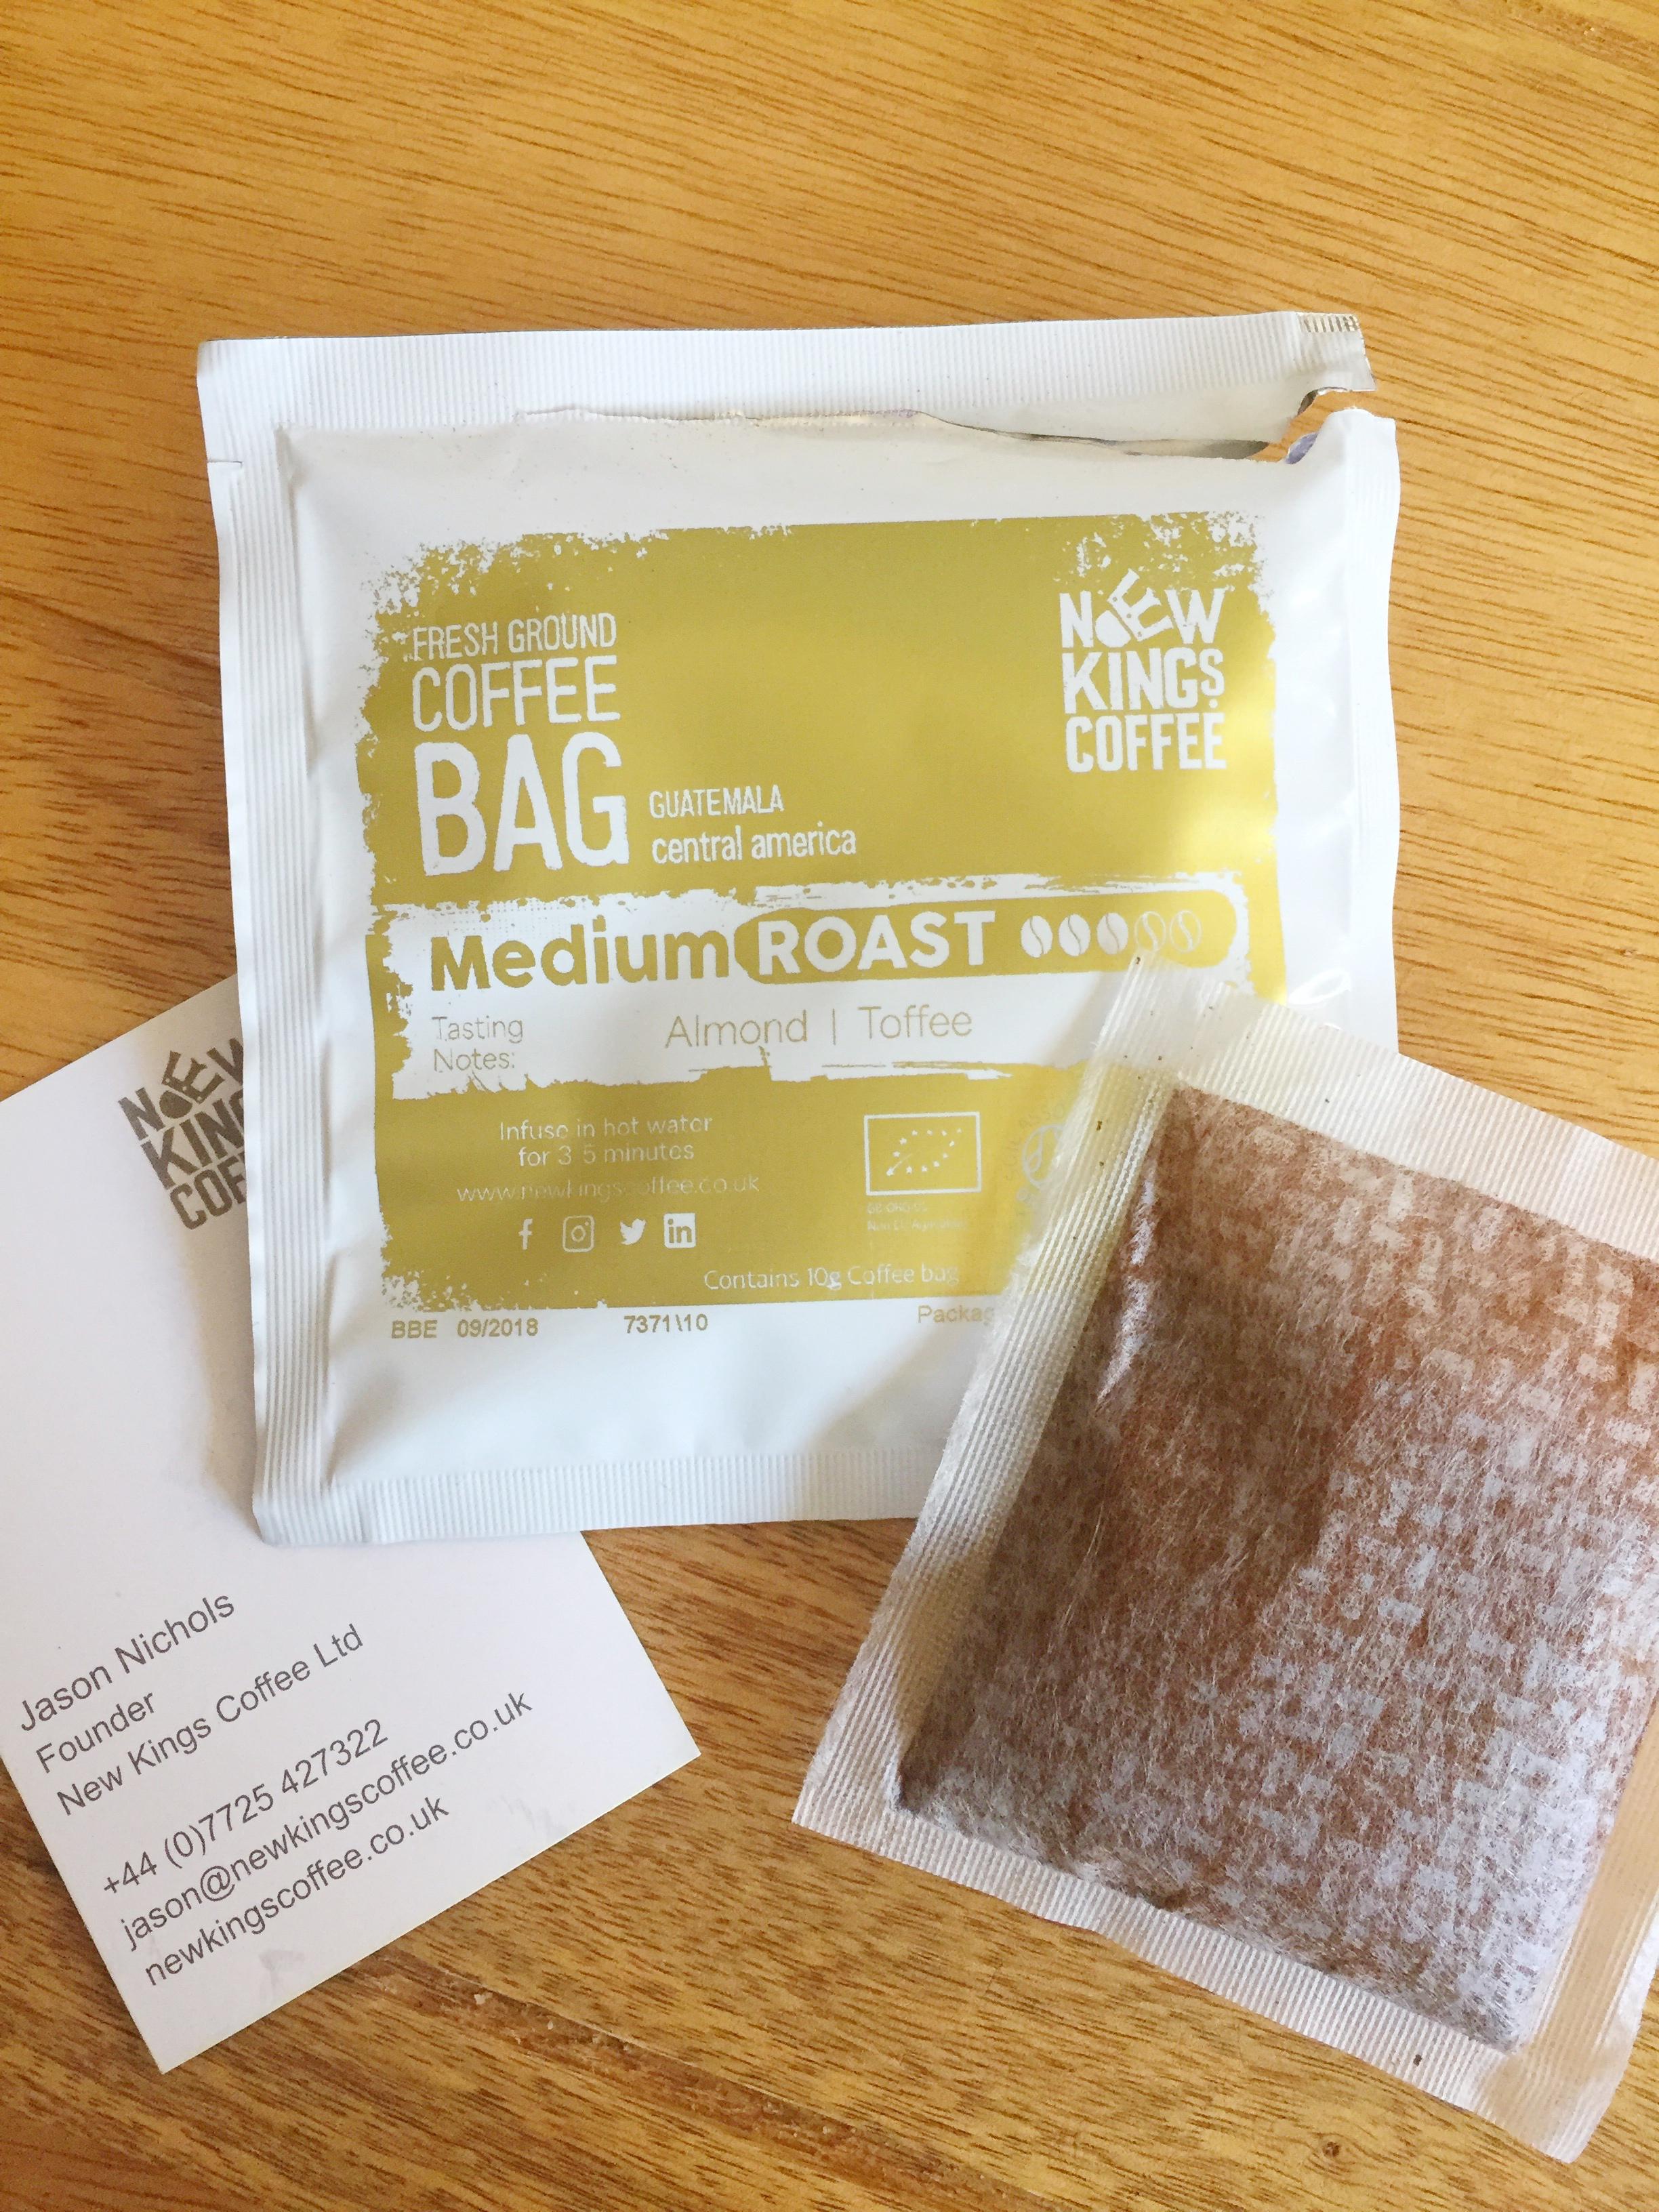 New Kings Coffee – Coffee Bag Revolution